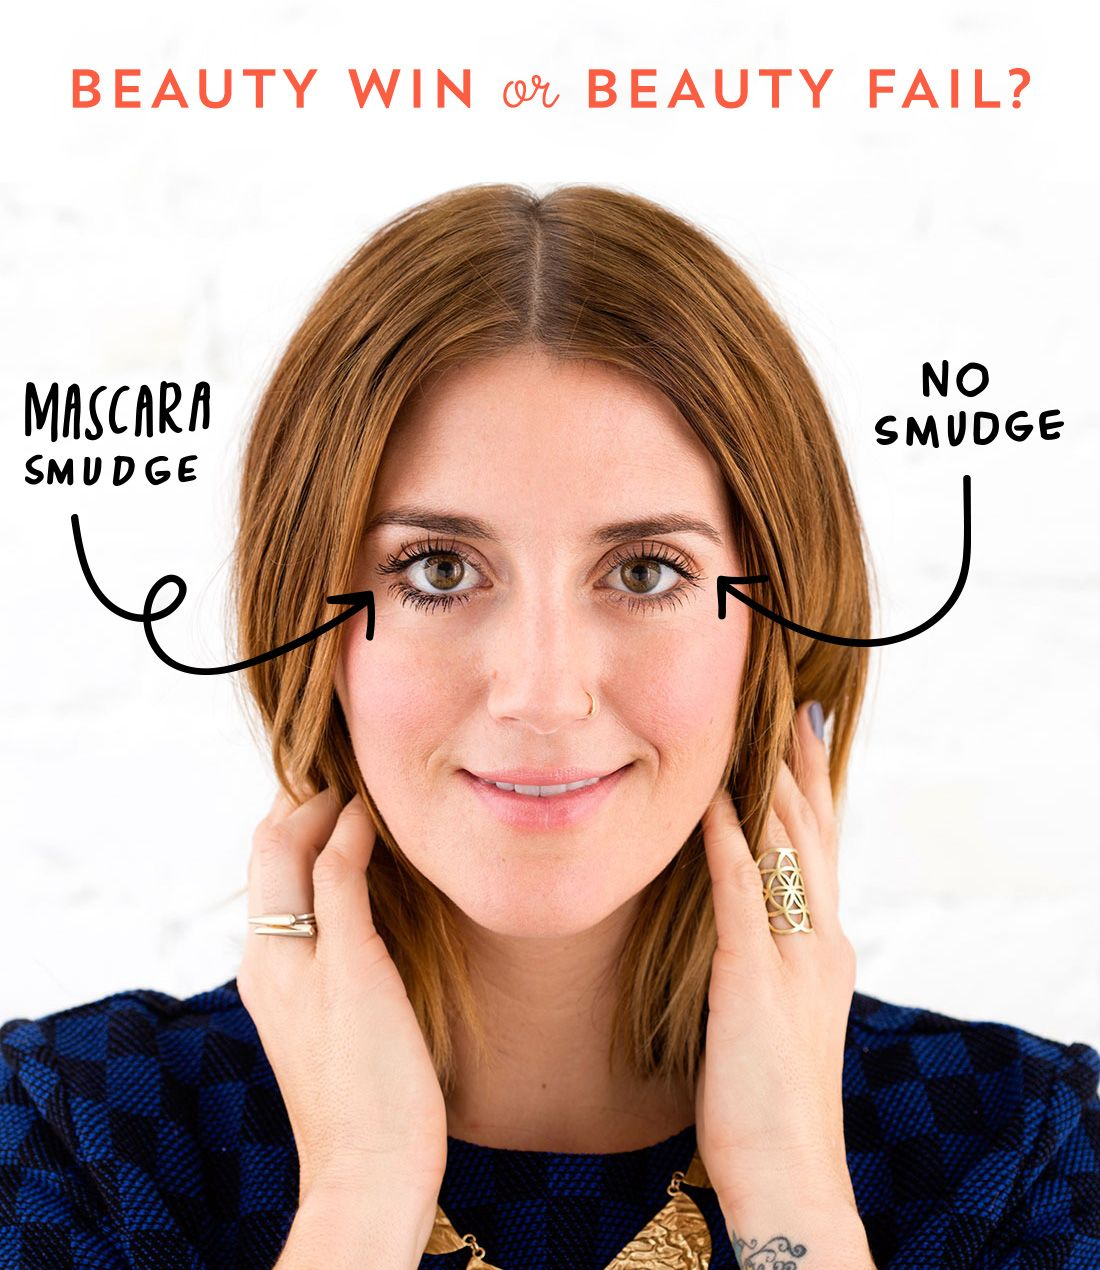 Beauty Mythbuster: Is Kylie Jenner's Mascara Hack a Beauty Win or a Beauty Fail? via Brit + Co